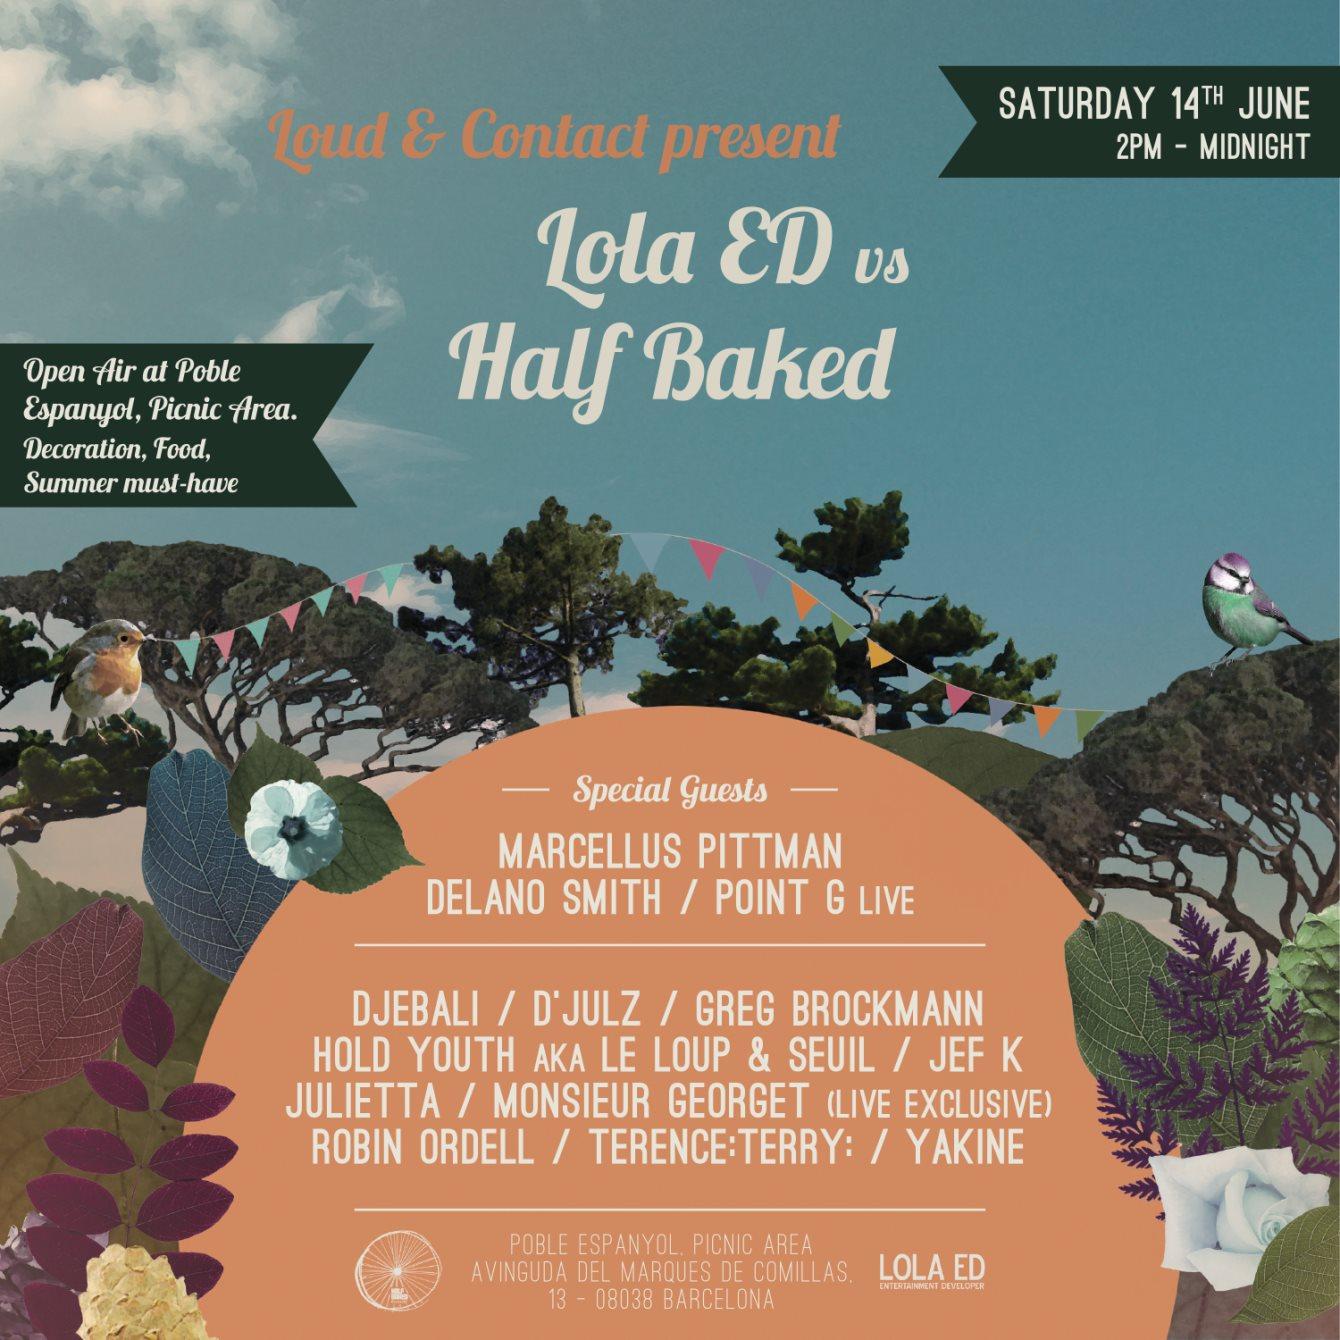 Lola ED vs Half Baked Showcase Open AIR - Flyer front